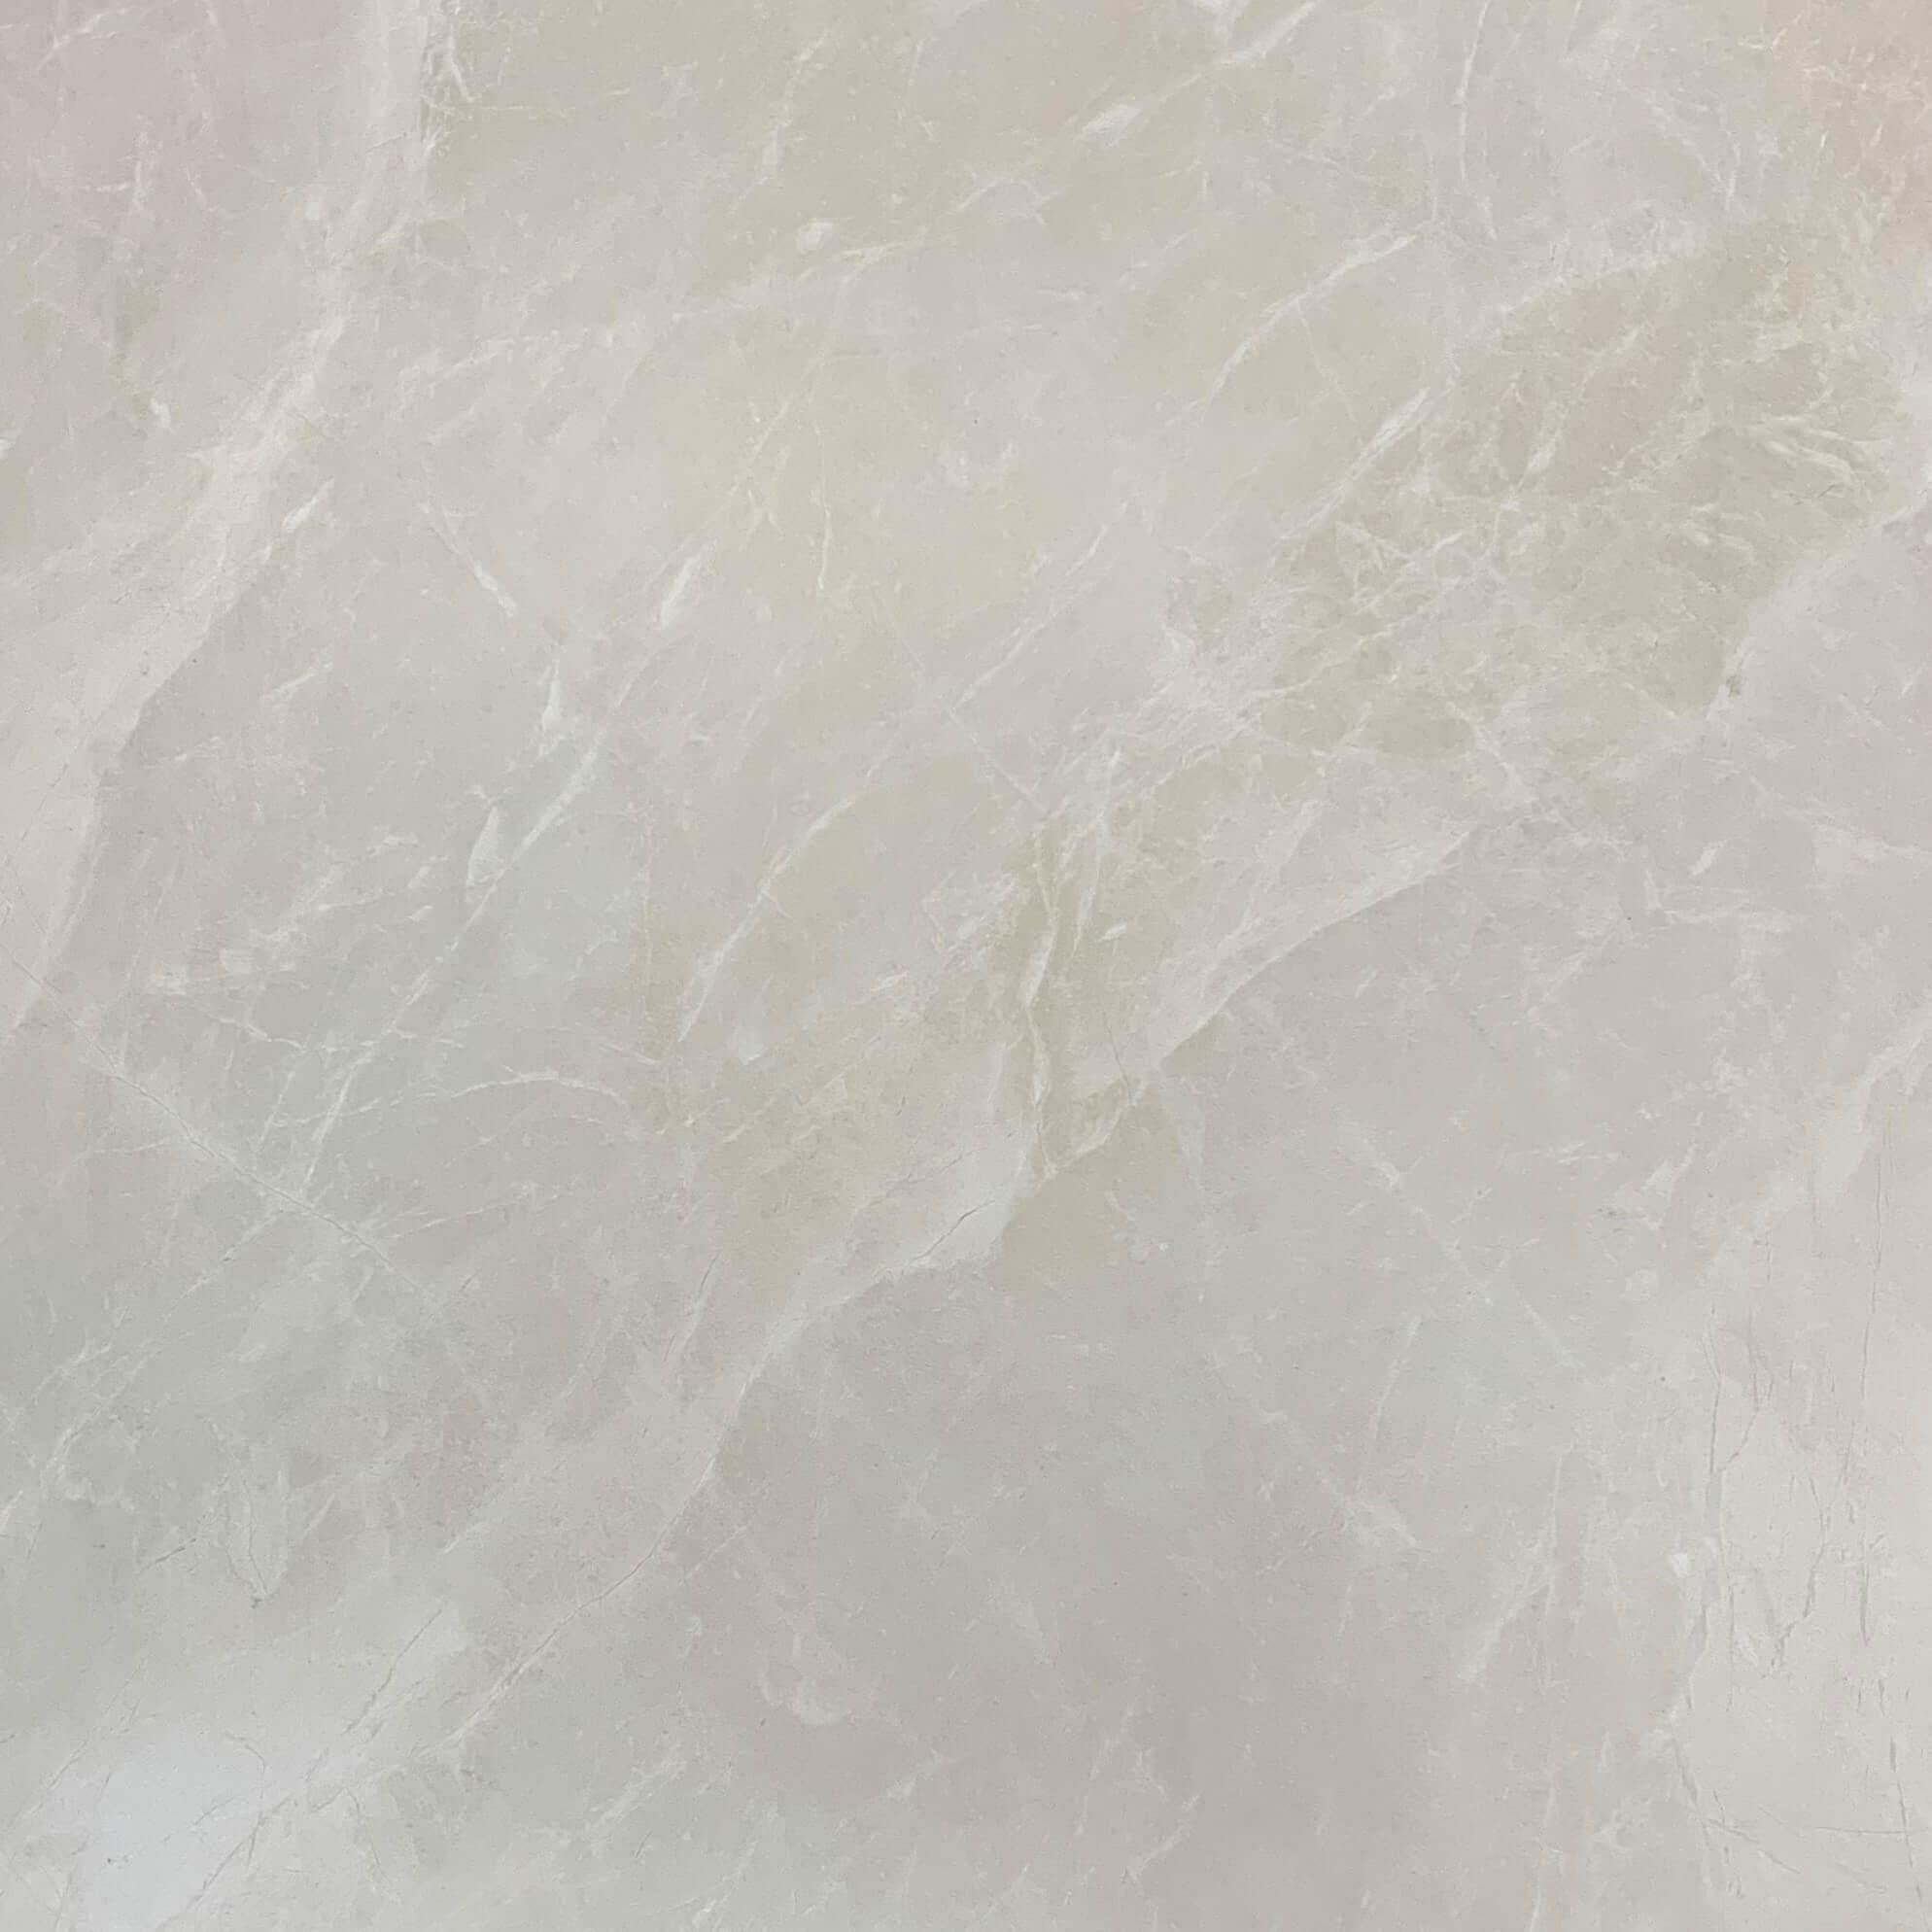 Crema Marfil Marble Look Glaze Polished Rectified Porcelain Tile 3317